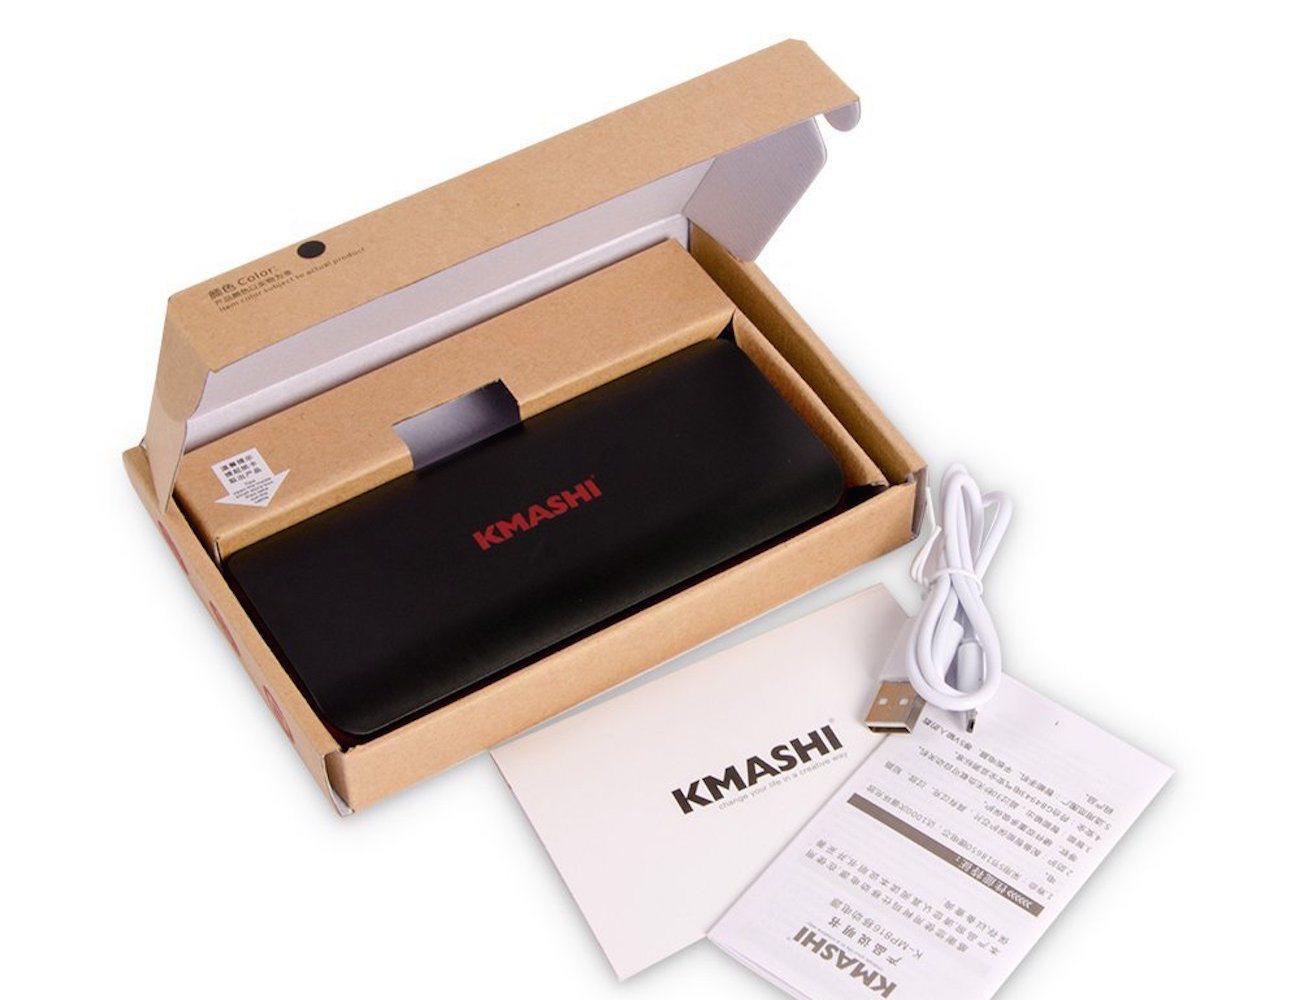 KMASHI Dual USB Portable Battery